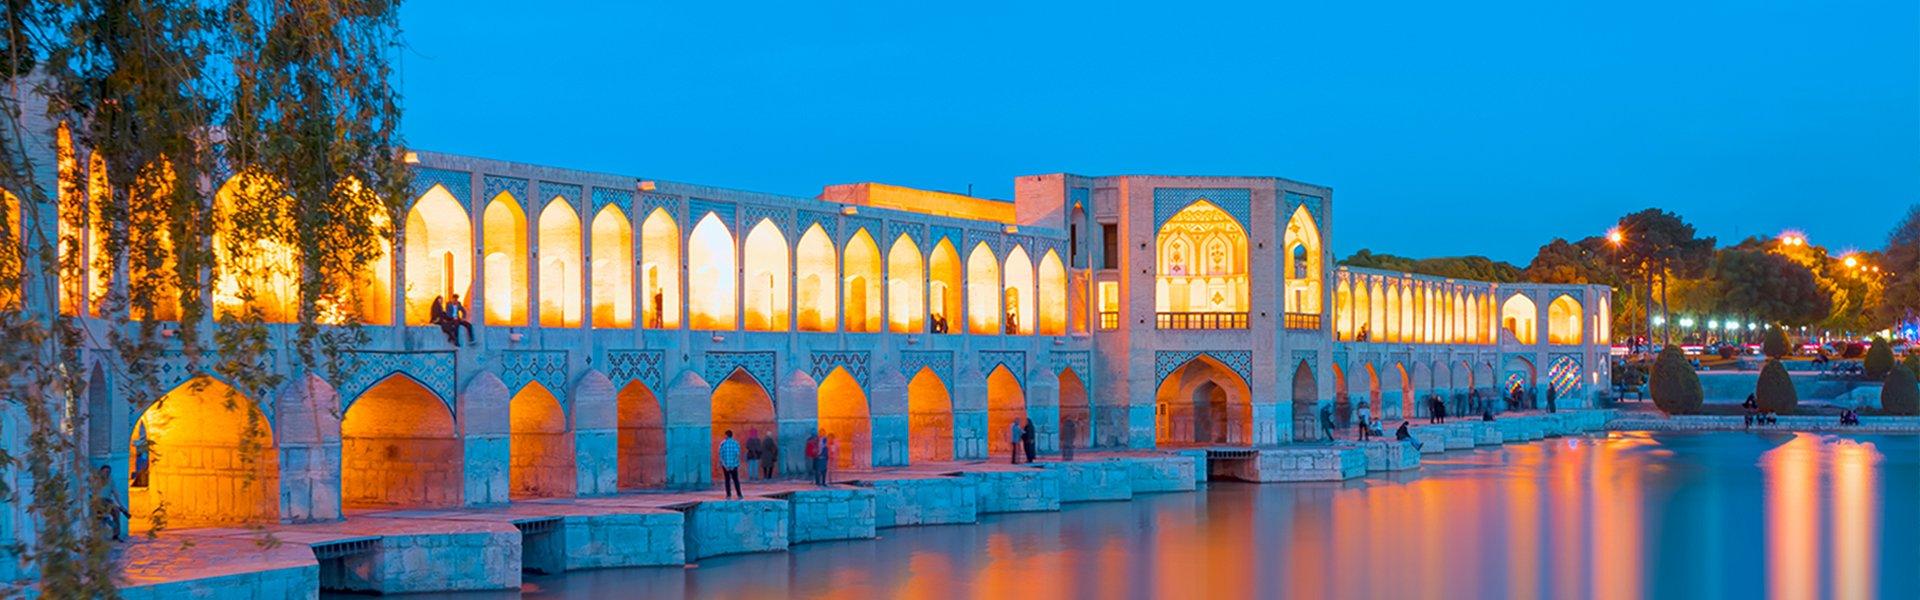 Pol-e Khaju brug in Isfahan, Iran